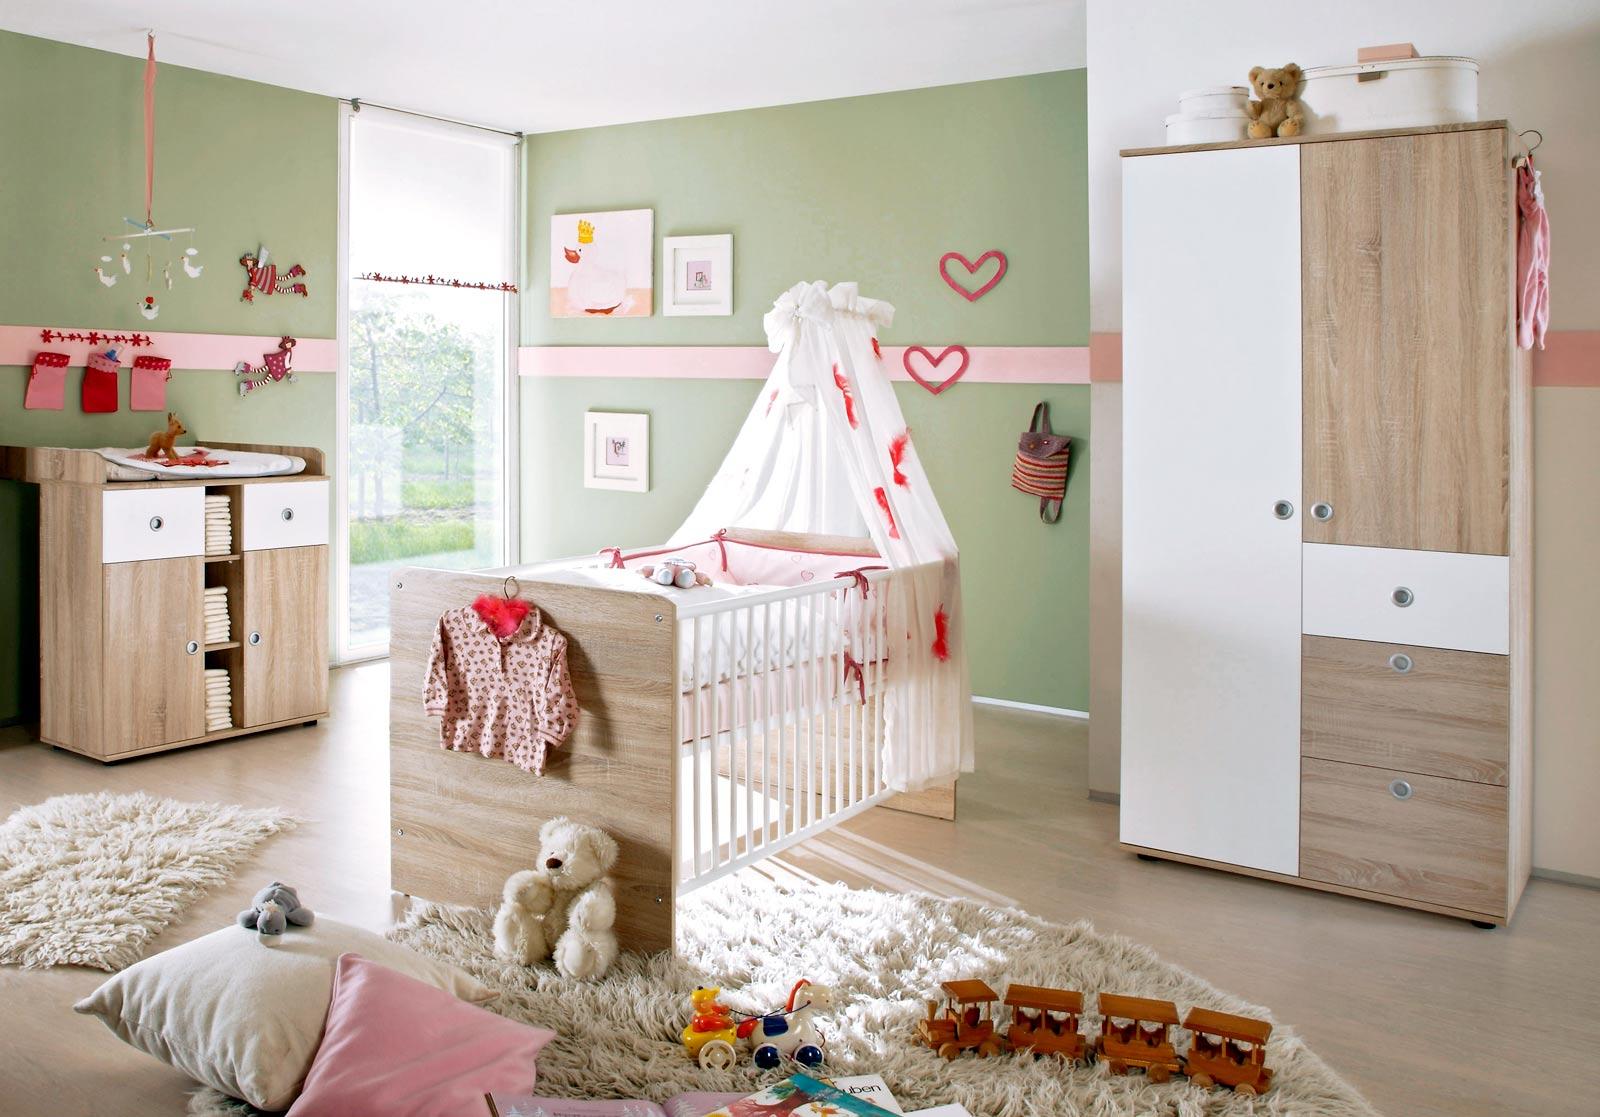 Babyzimmer kinderzimmer komplett babym bel komplettset wiki 1 eiche sonoma wei ebay for Kinderzimmer komplettset